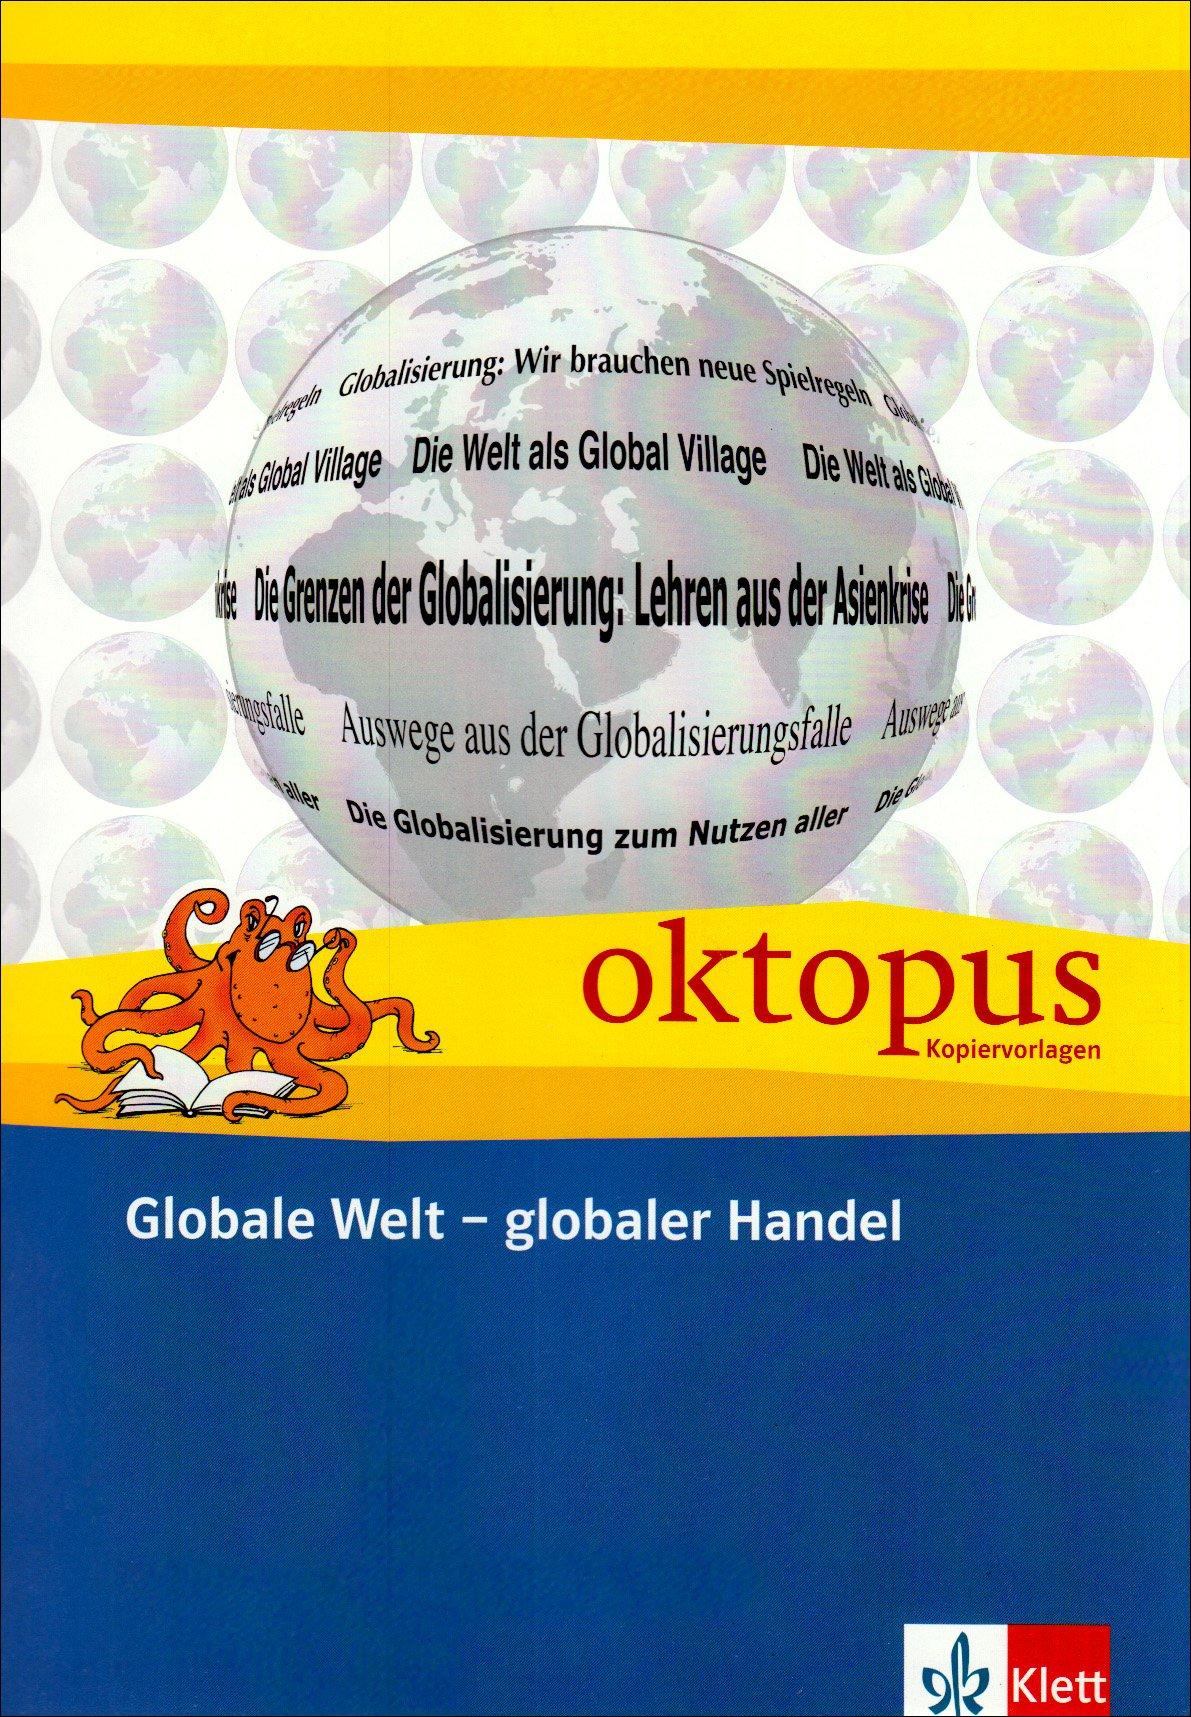 Globale Welt - globaler Handel (Oktopus Kopiervorlagen)